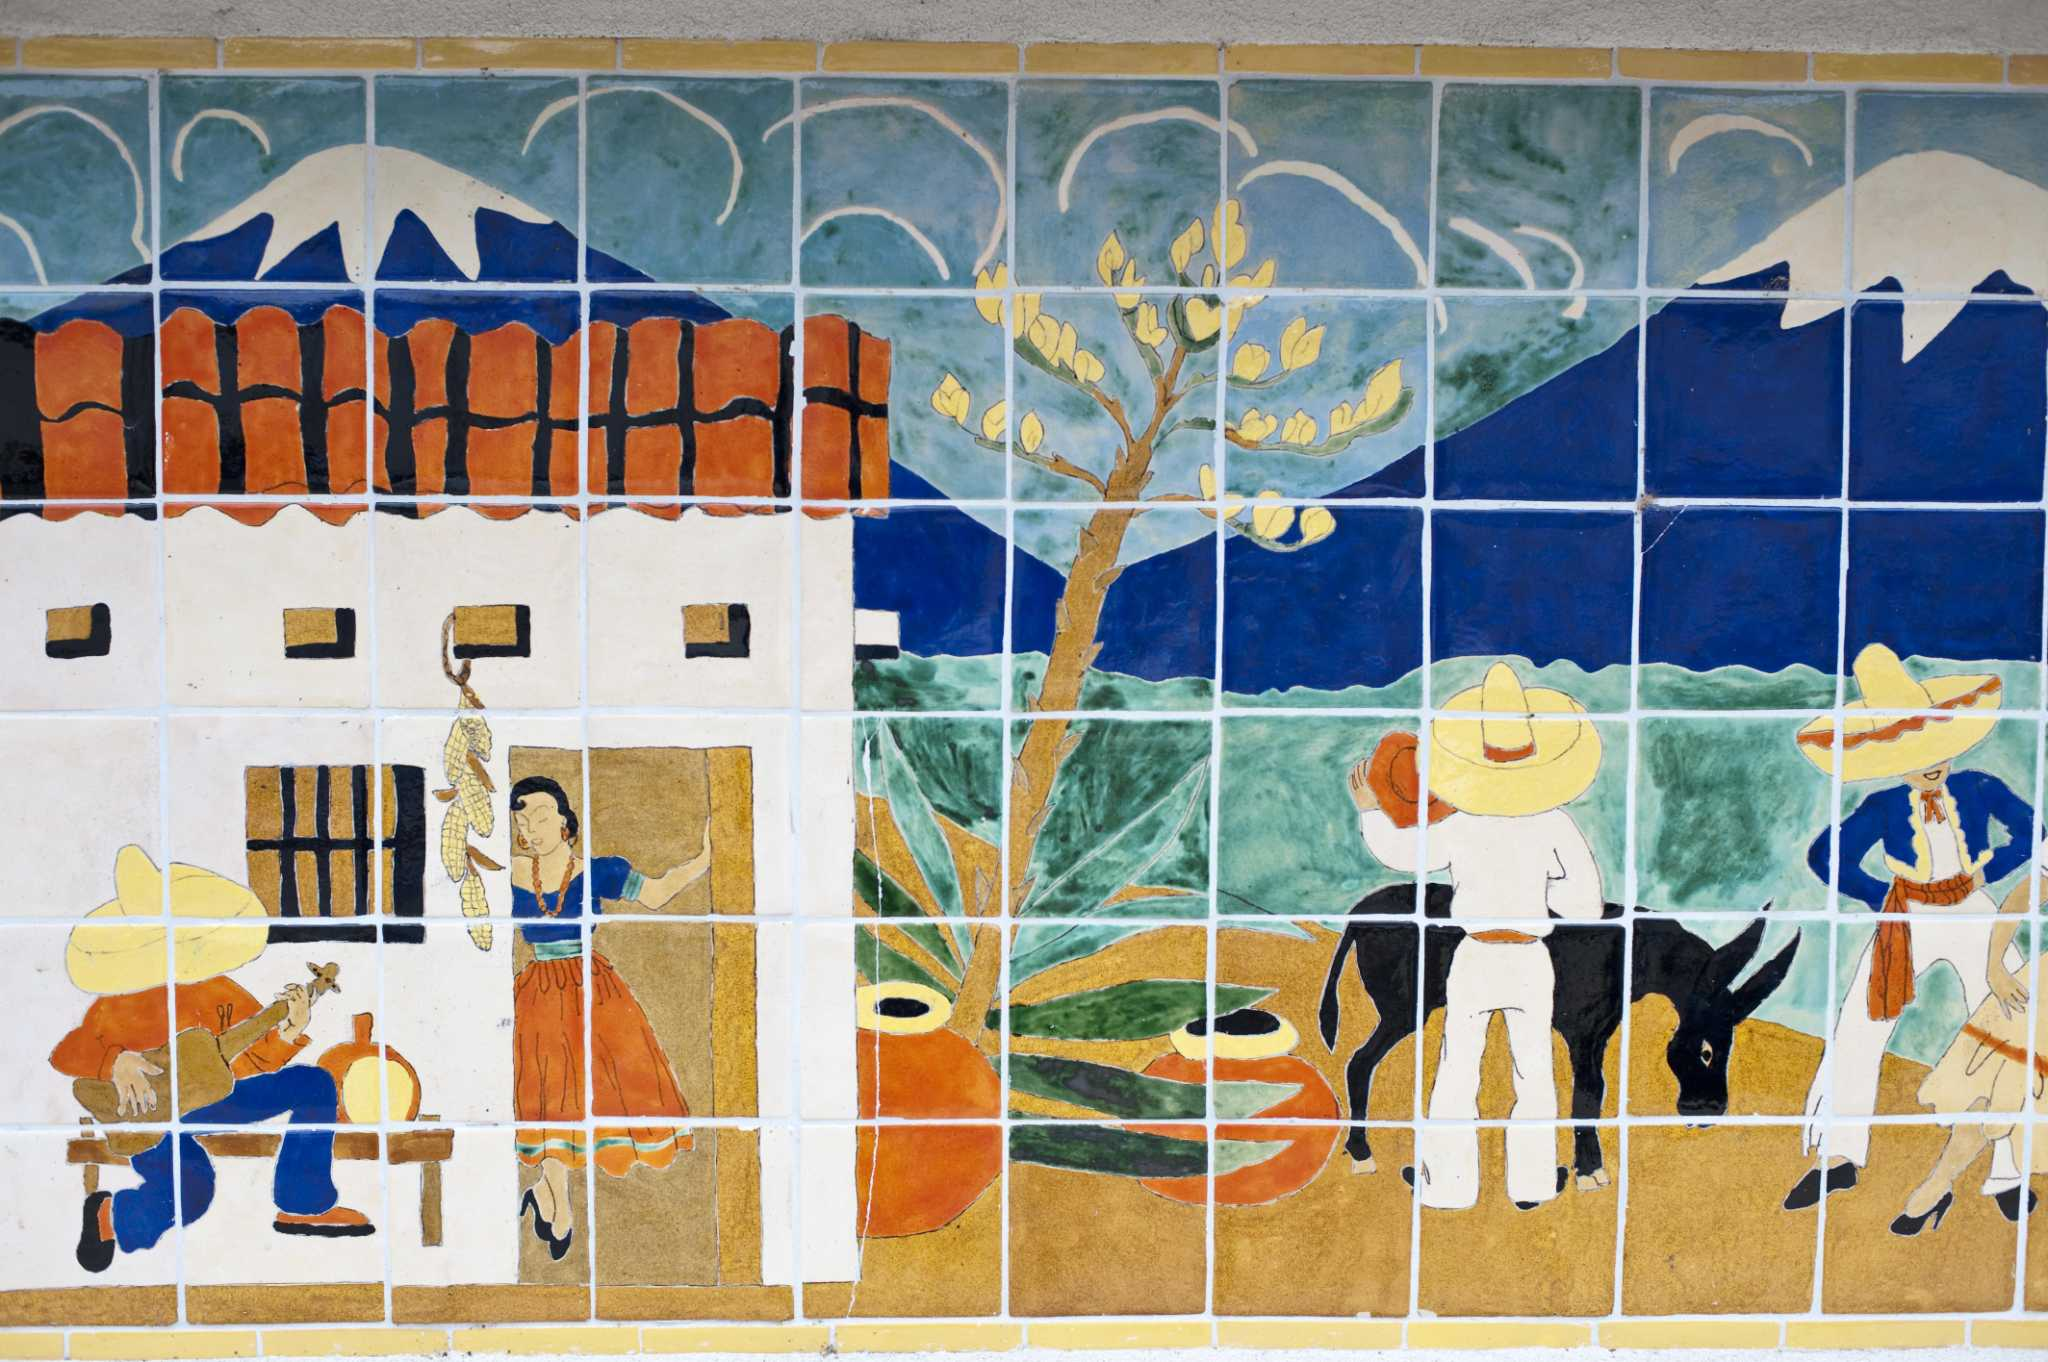 Tile Murals On River Walk Are Hidden Treasures Worth Hunting Expressnews